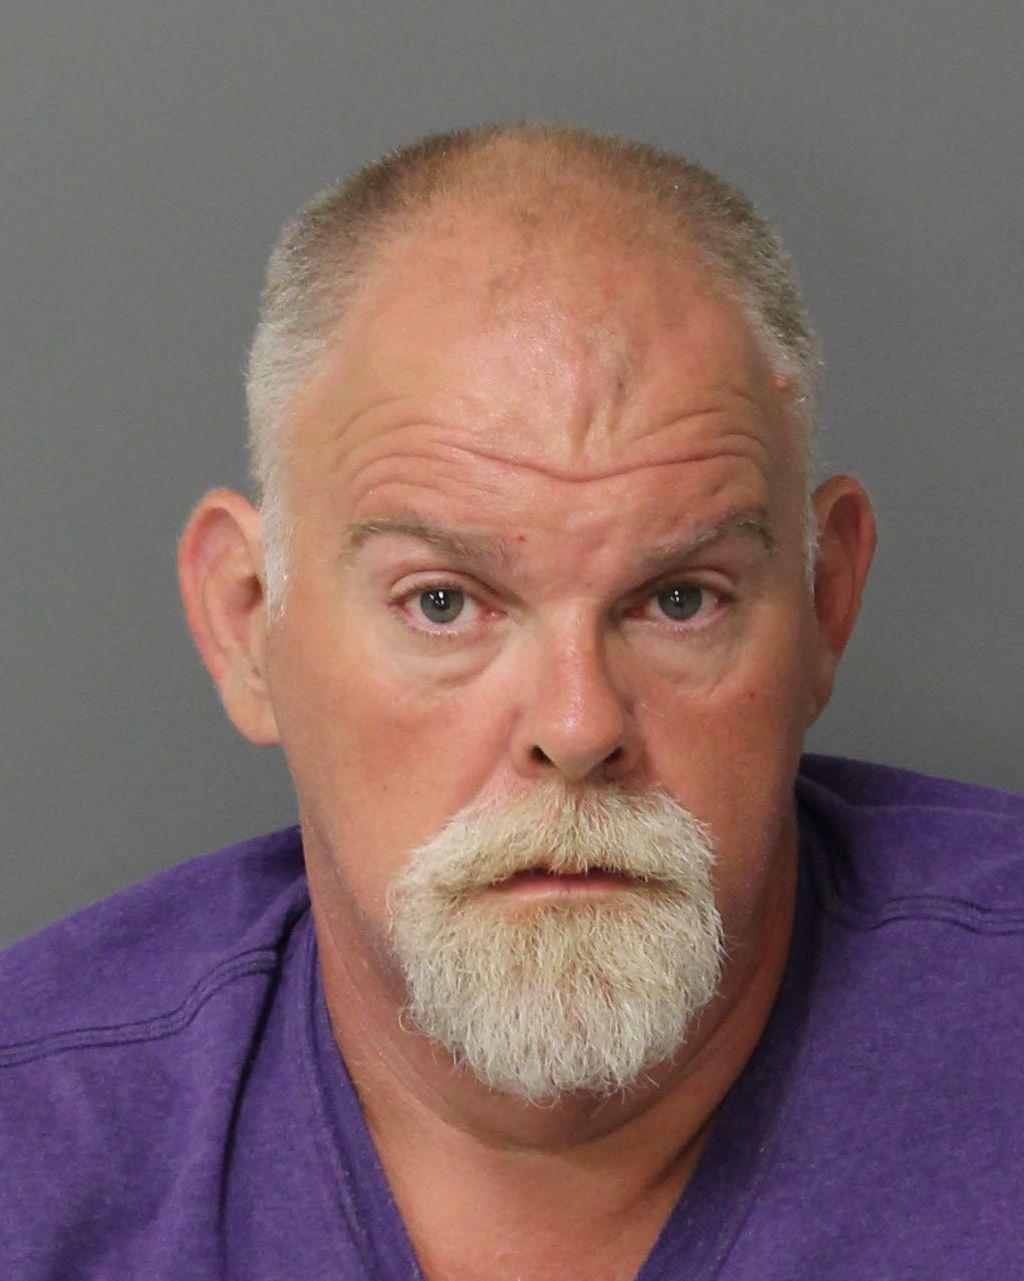 SMITH STEVEN TODD Mugshot / County Arrests / Wake County Arrests